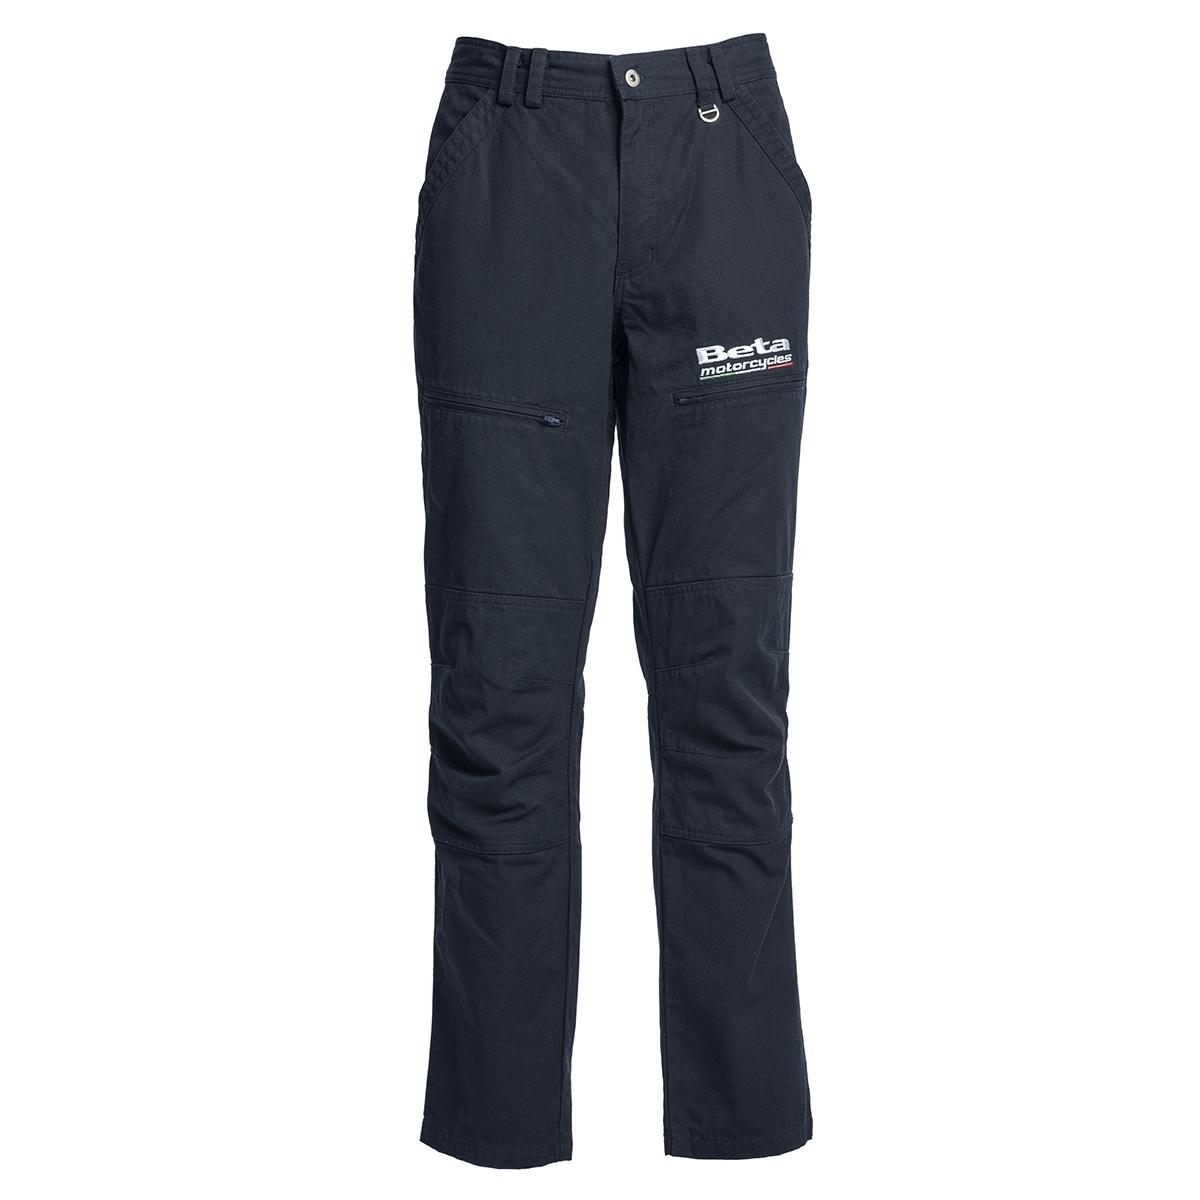 Beta paddock mekaanikon housut